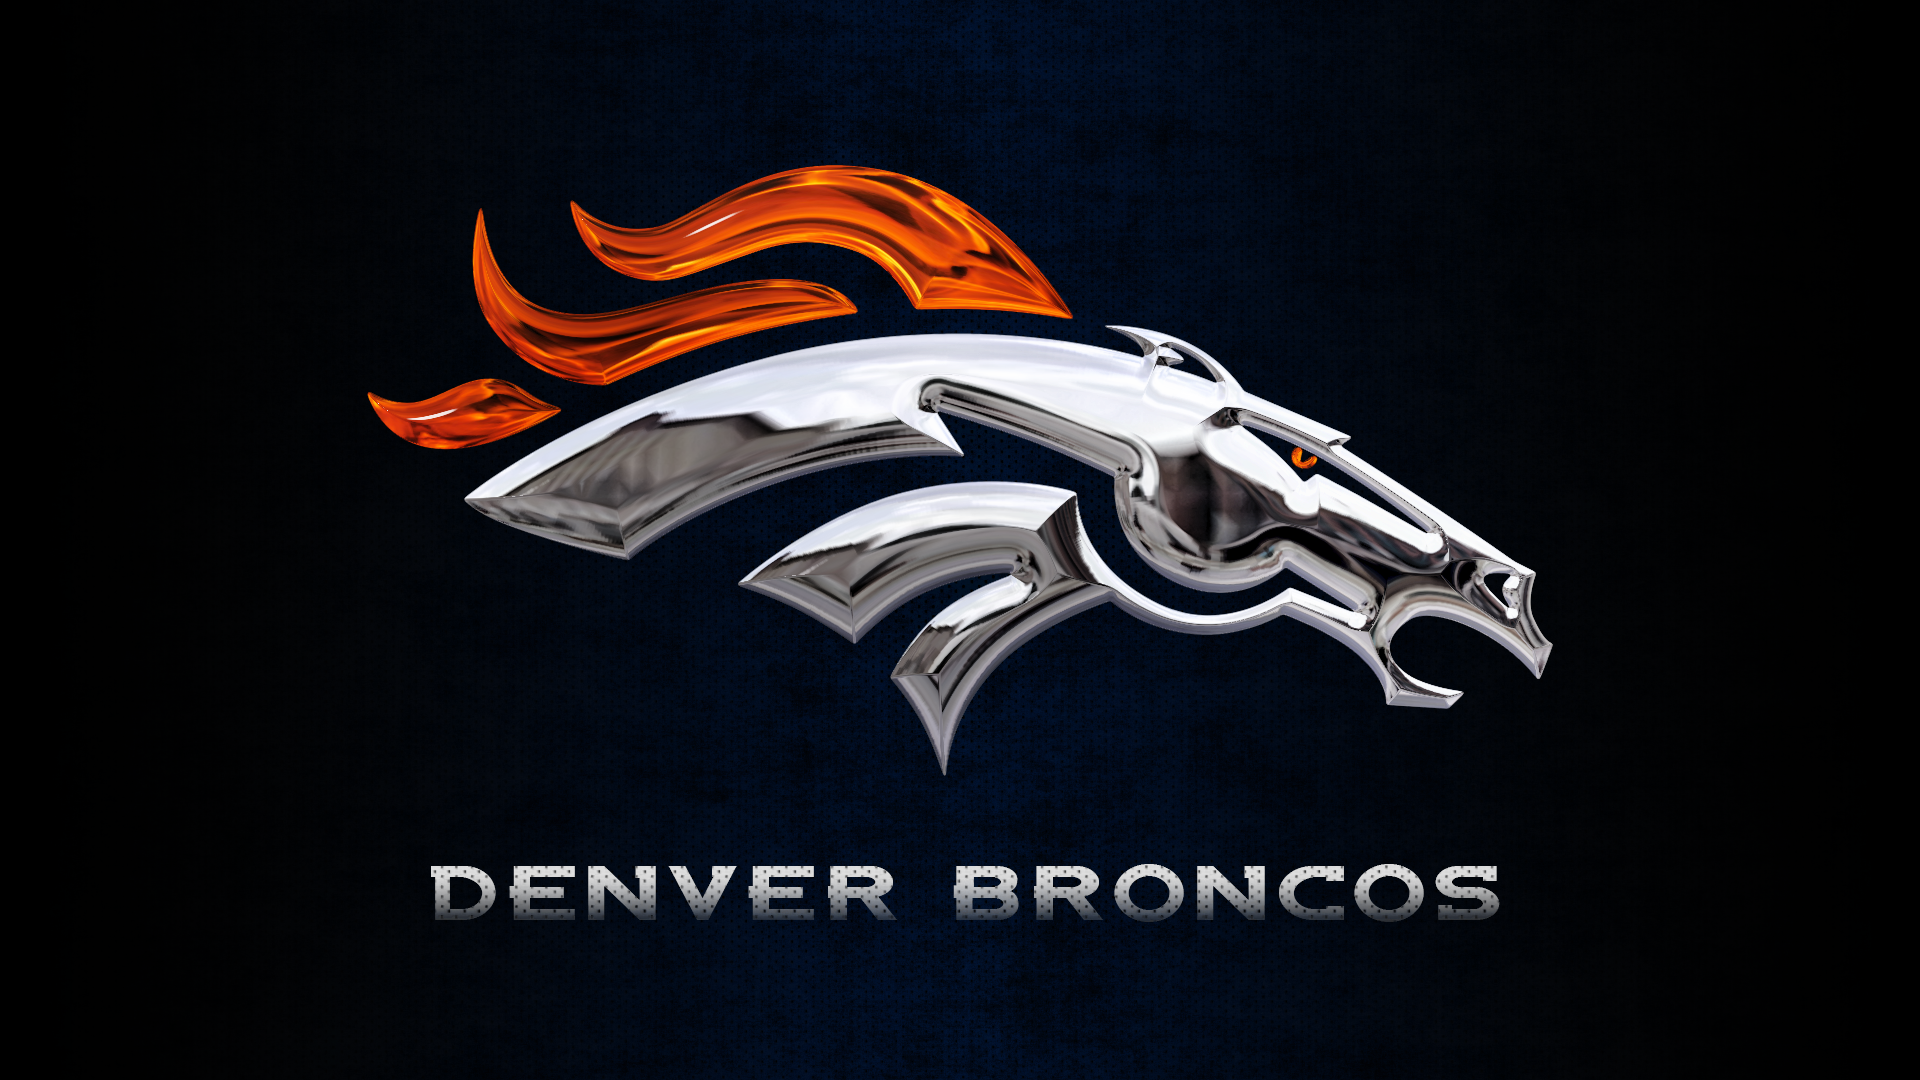 1920x1080 > Denver Broncos Wallpapers